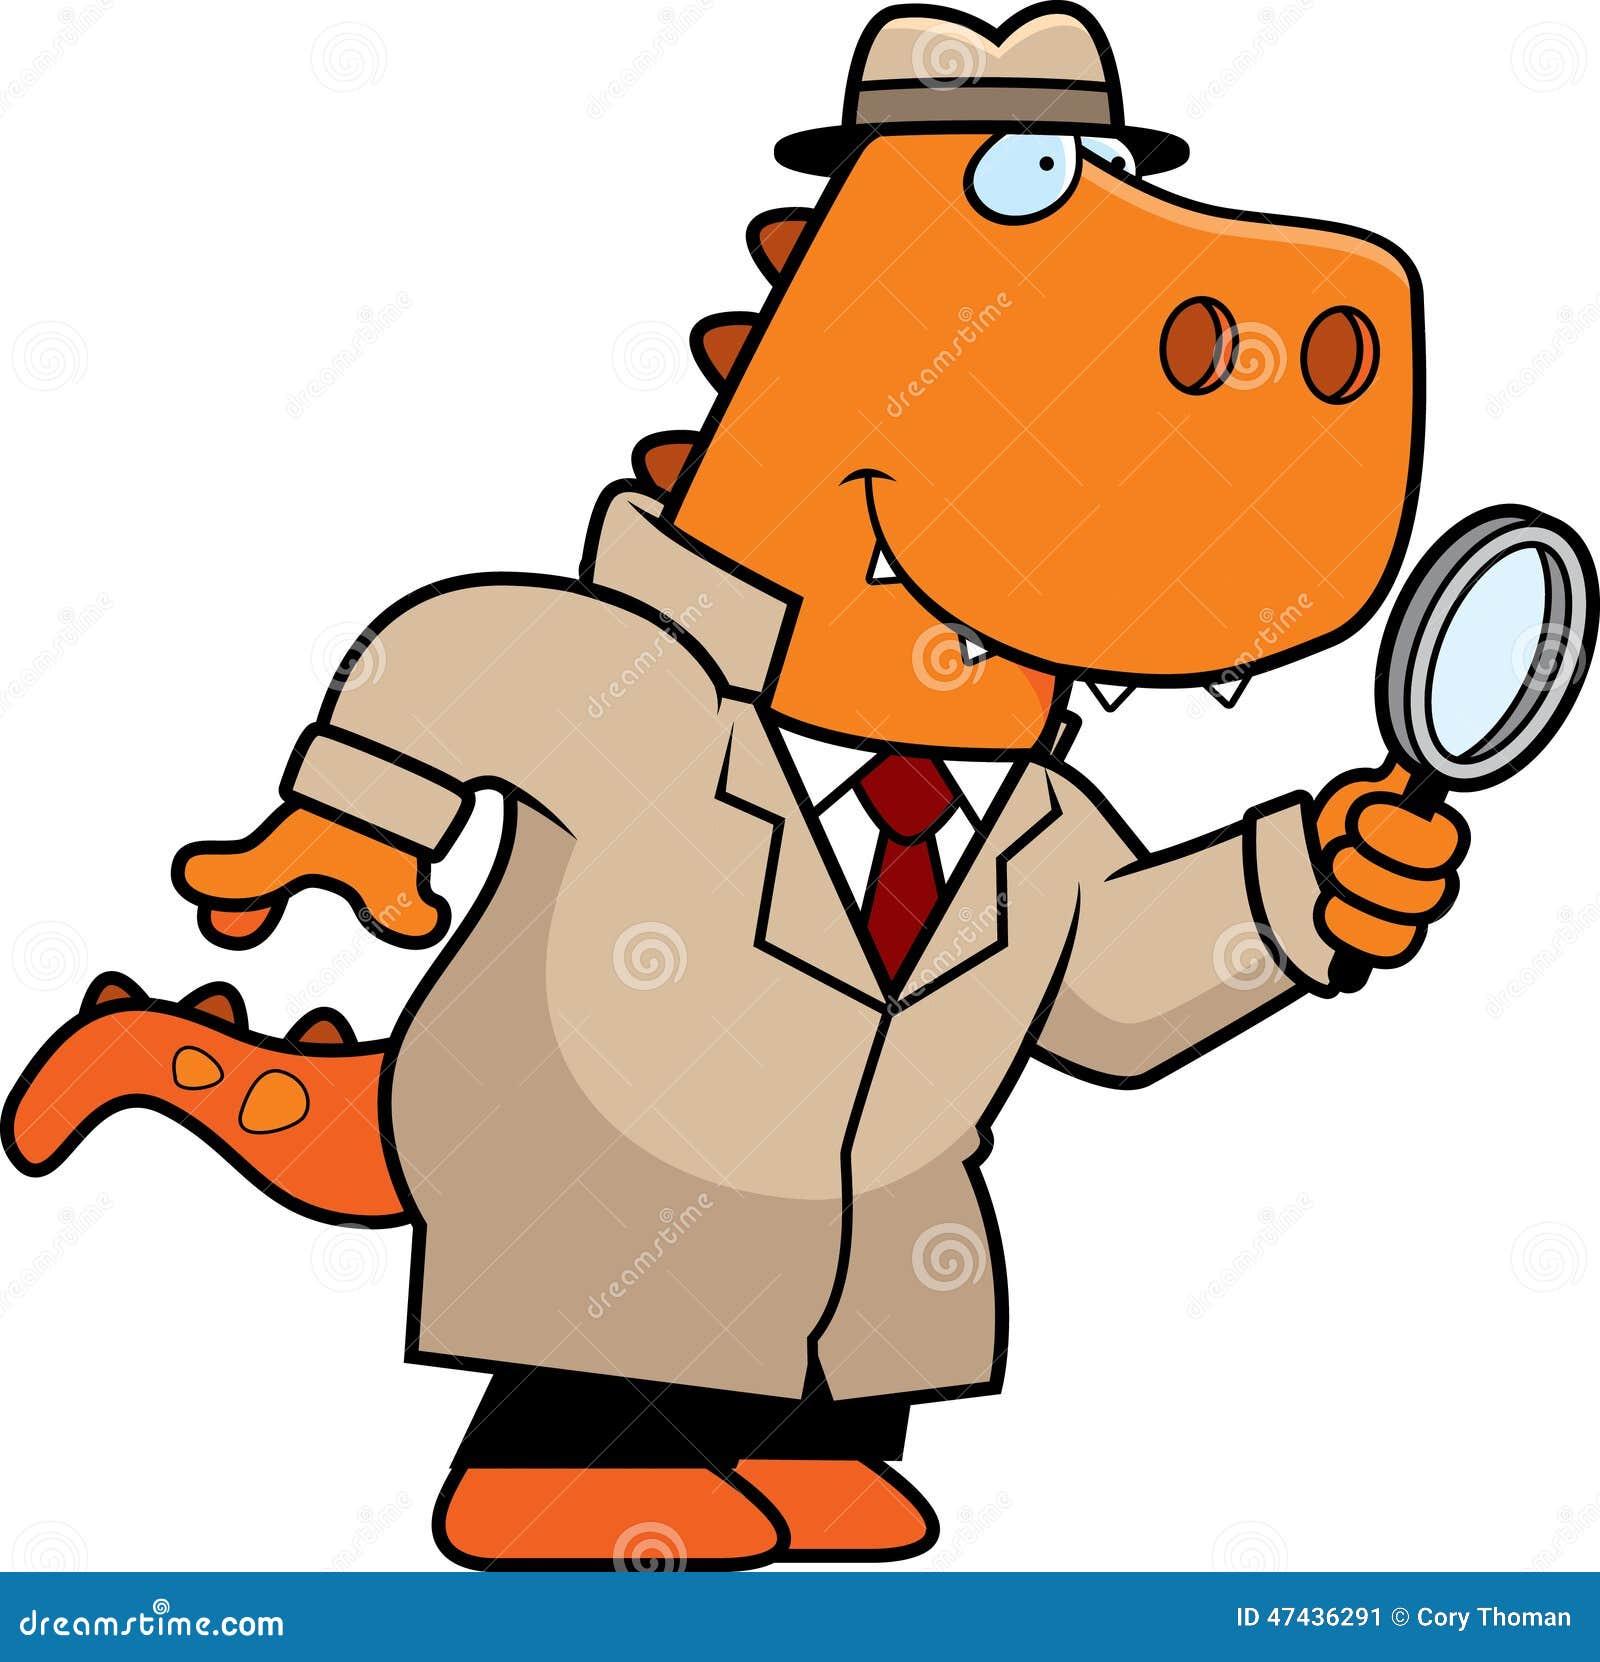 Image result for dinosaur detectives